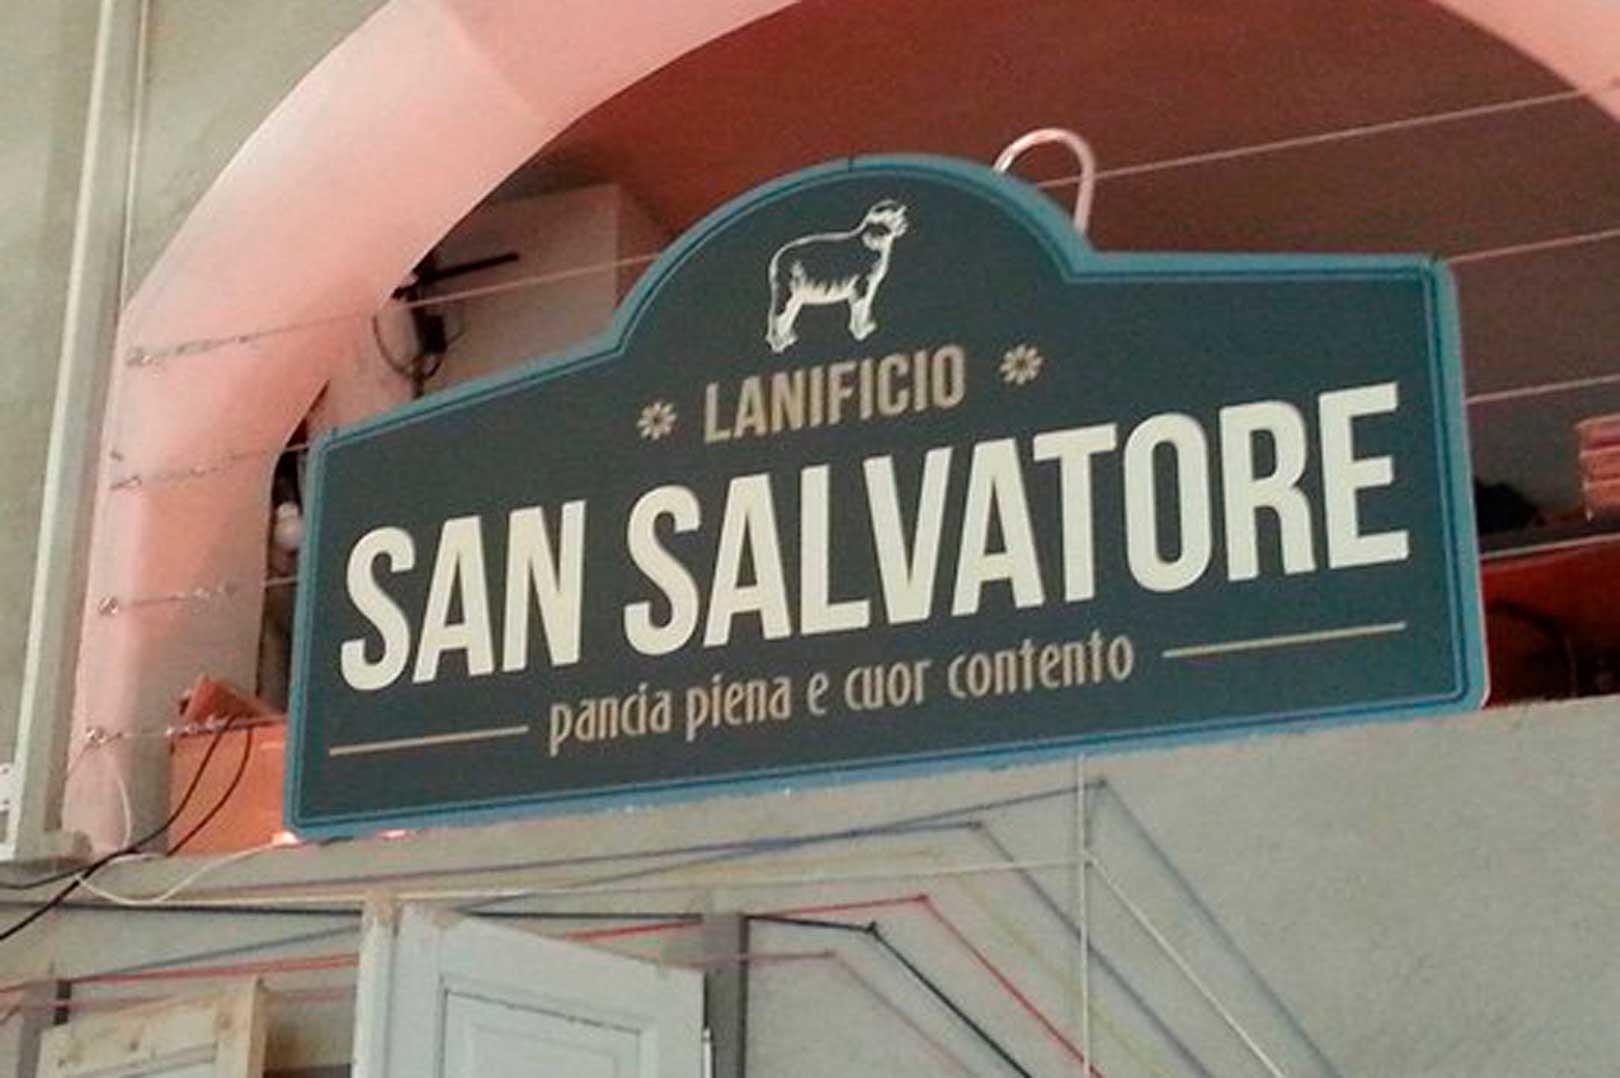 Lanificio San Salvatore - Torino